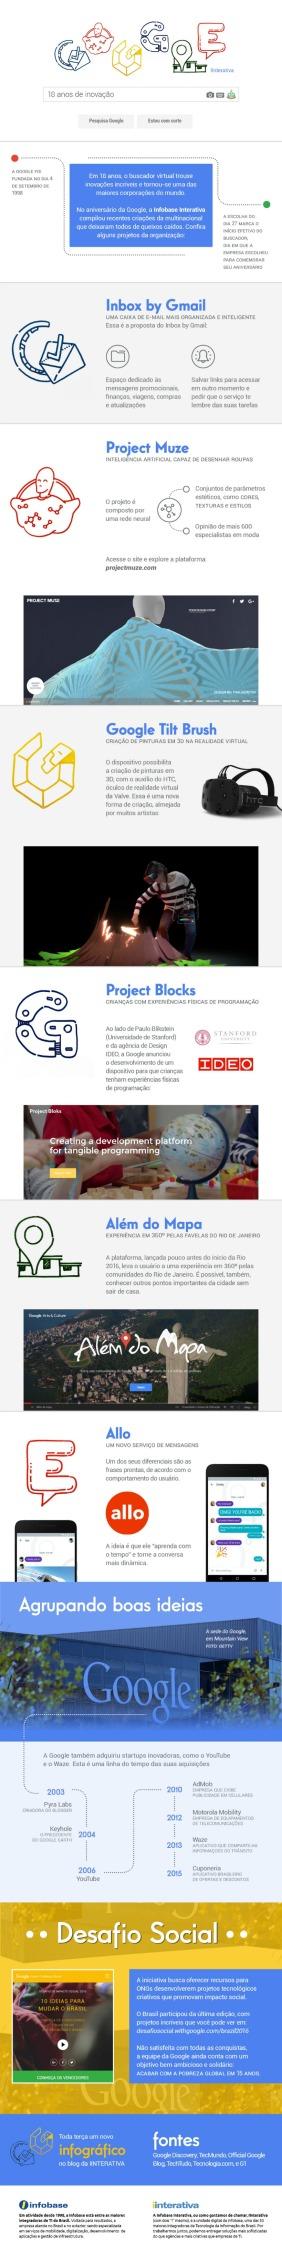 infografico_